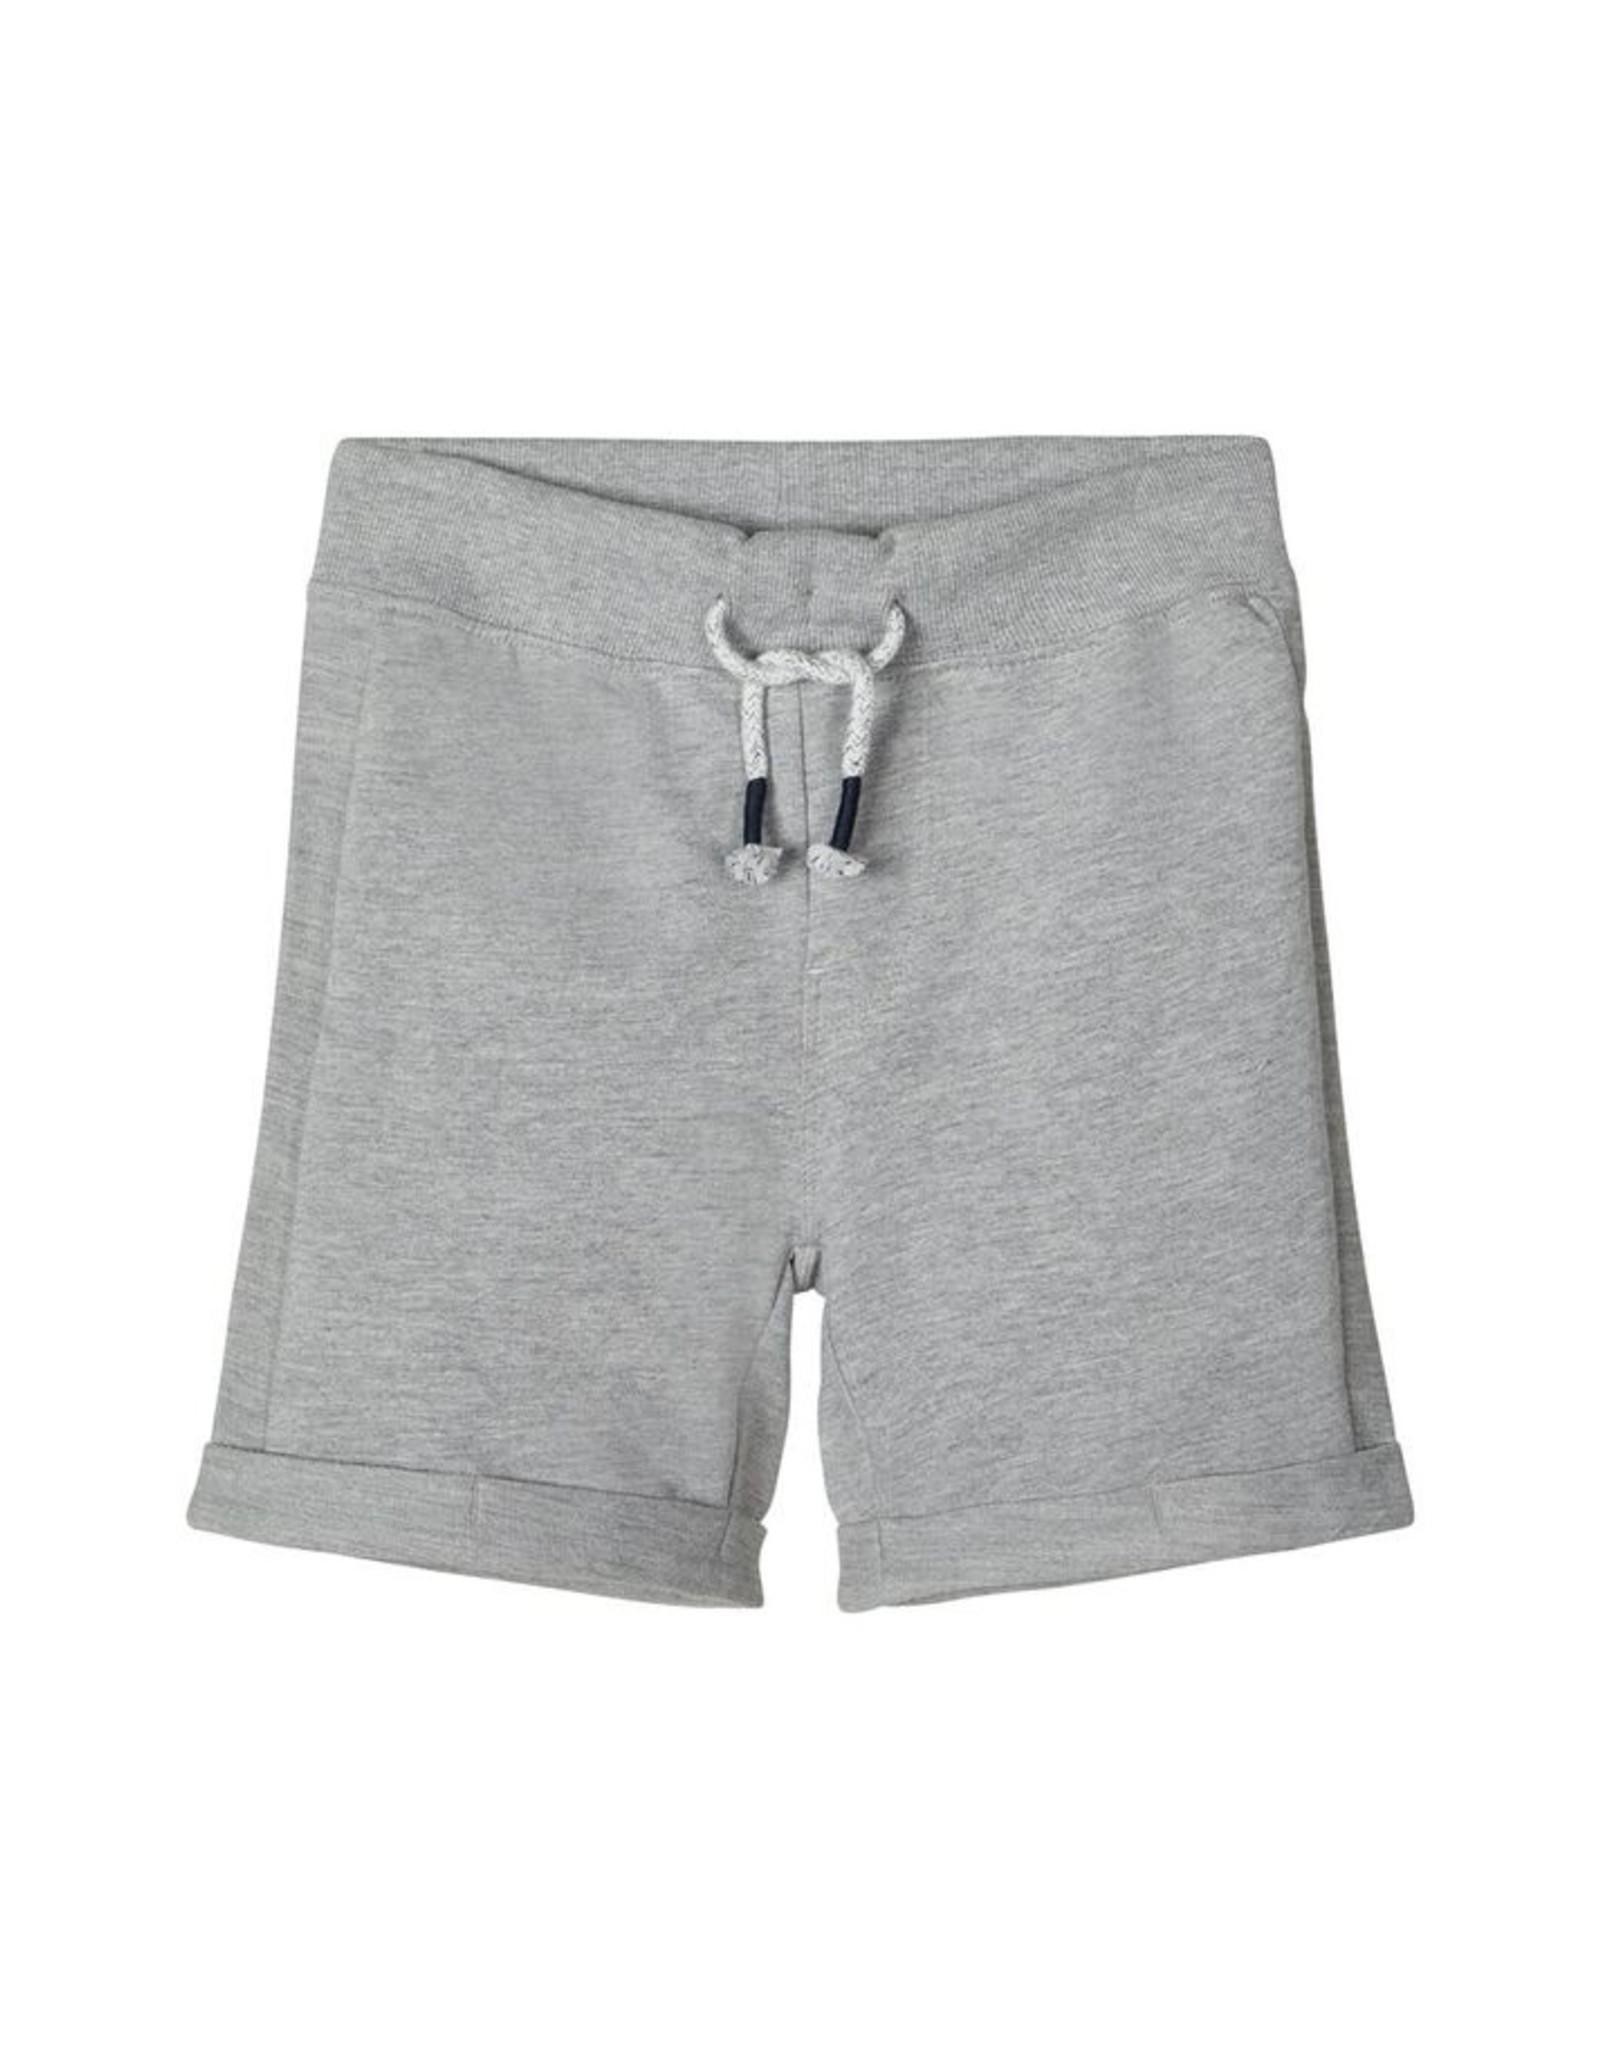 Name It Basis korte jongens short (2 kleuren)